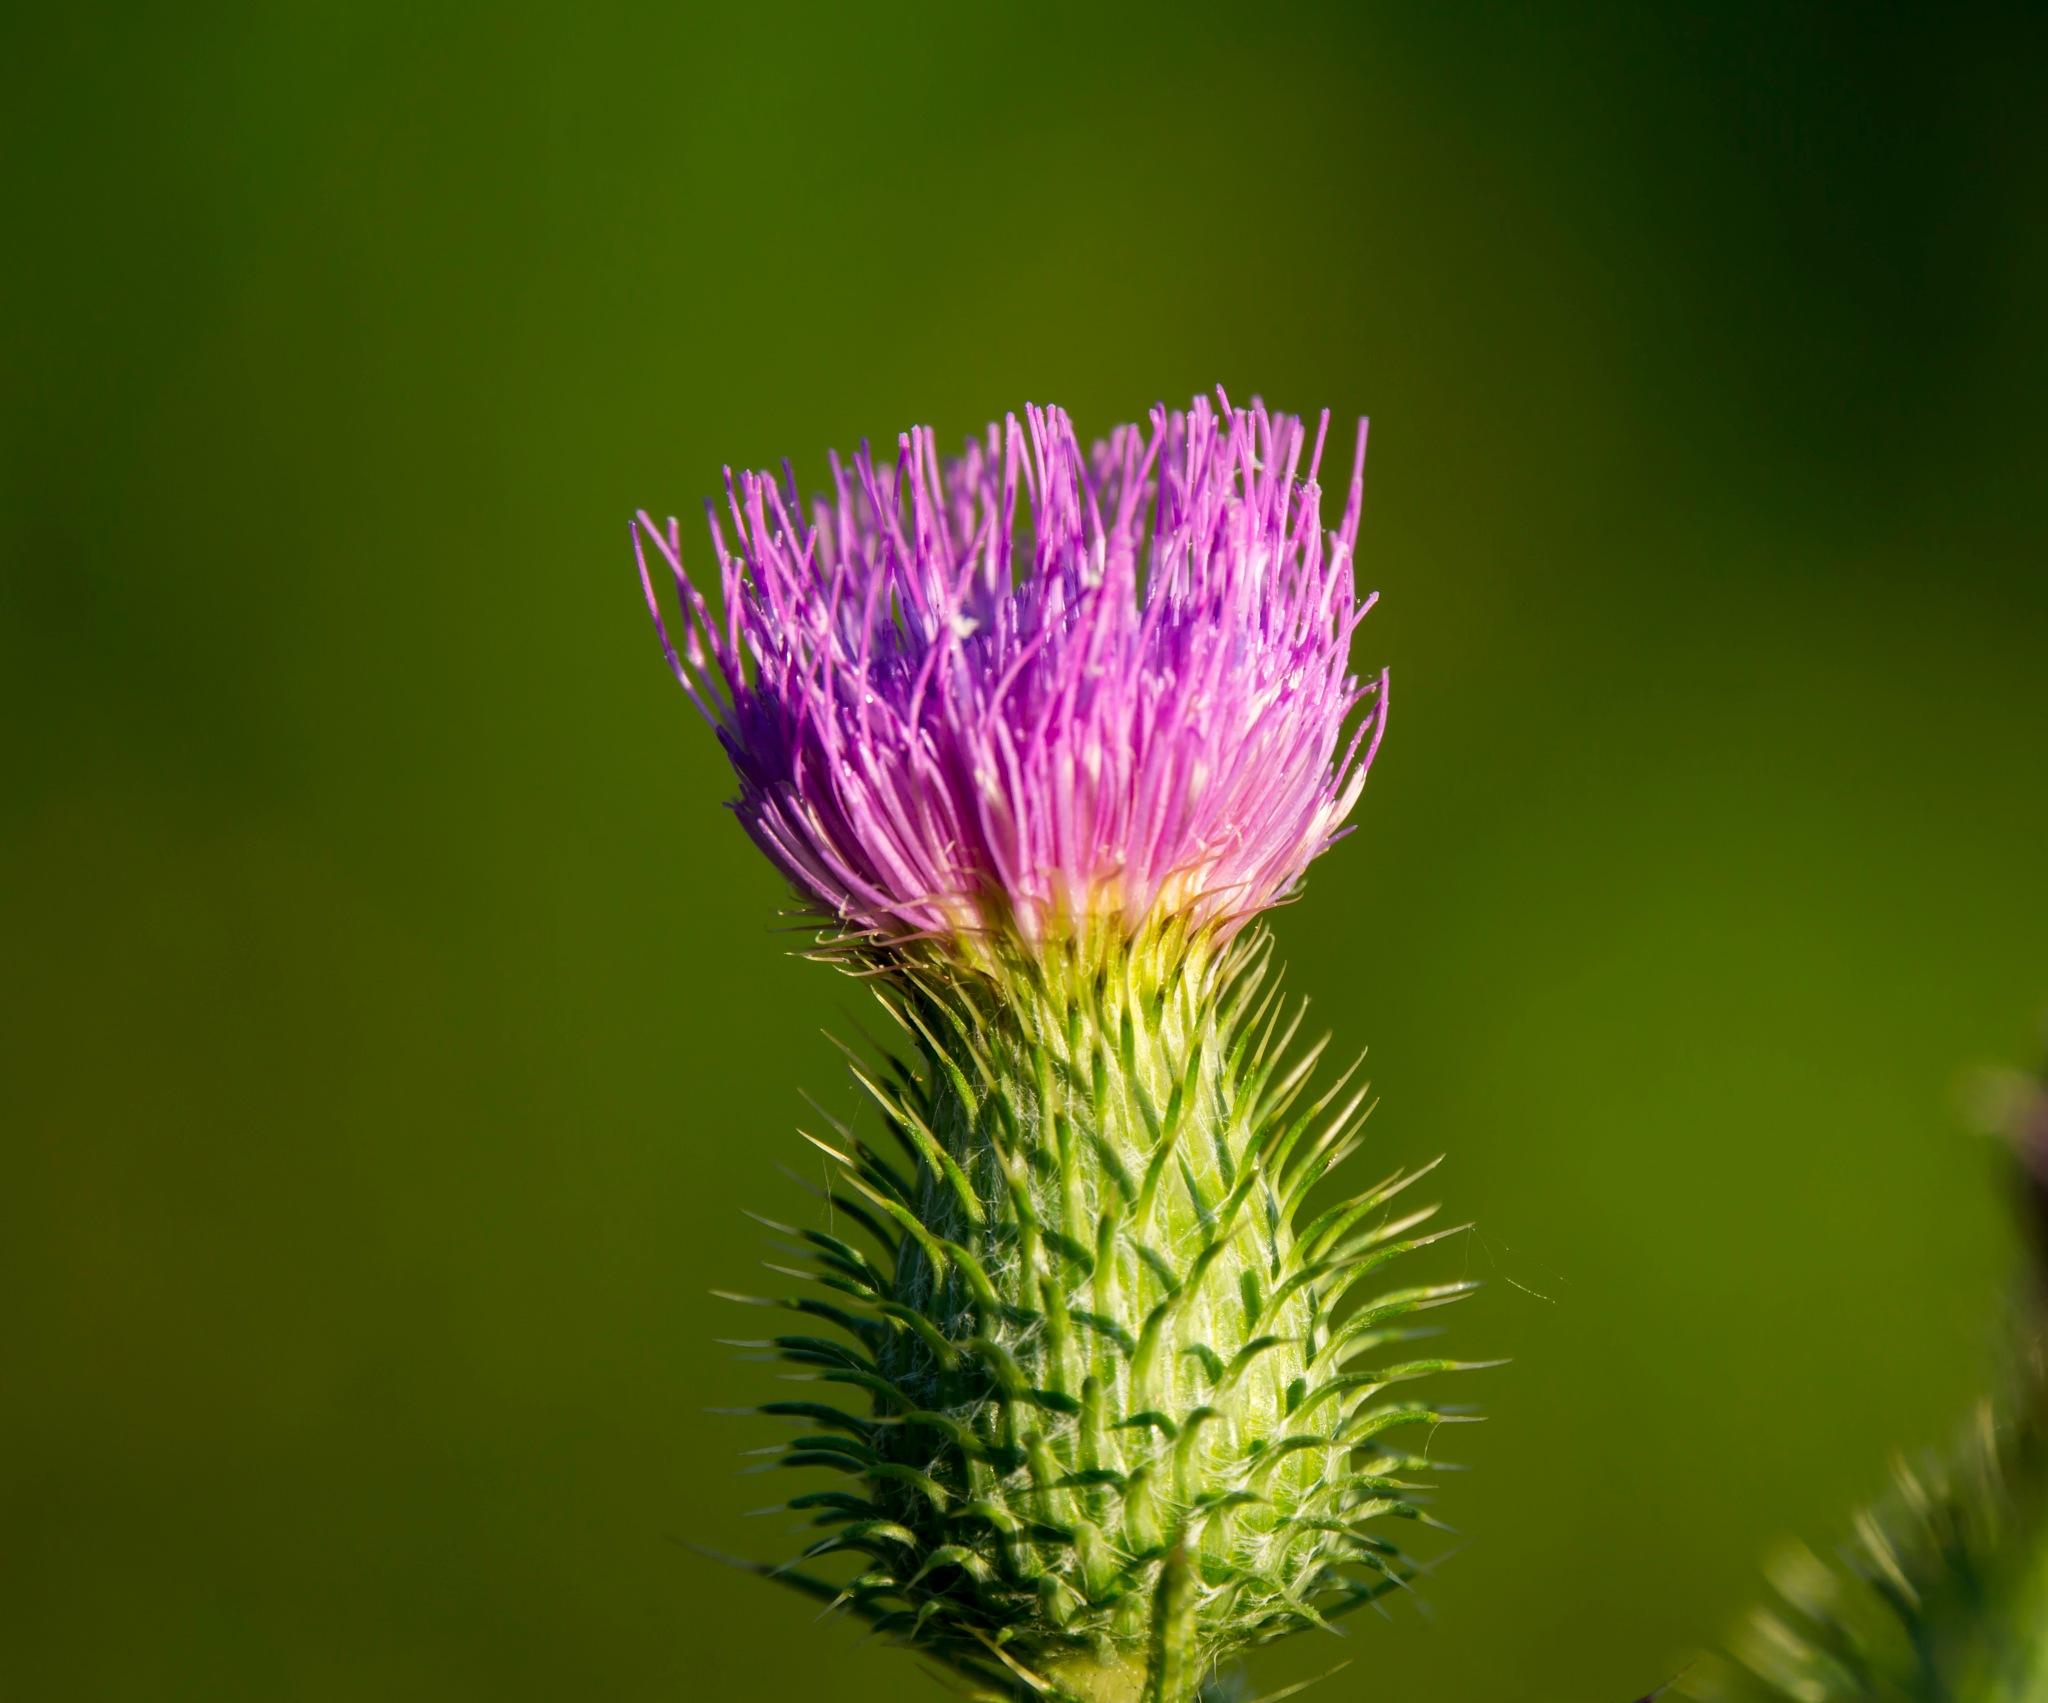 wild flower by lizardofthewisard